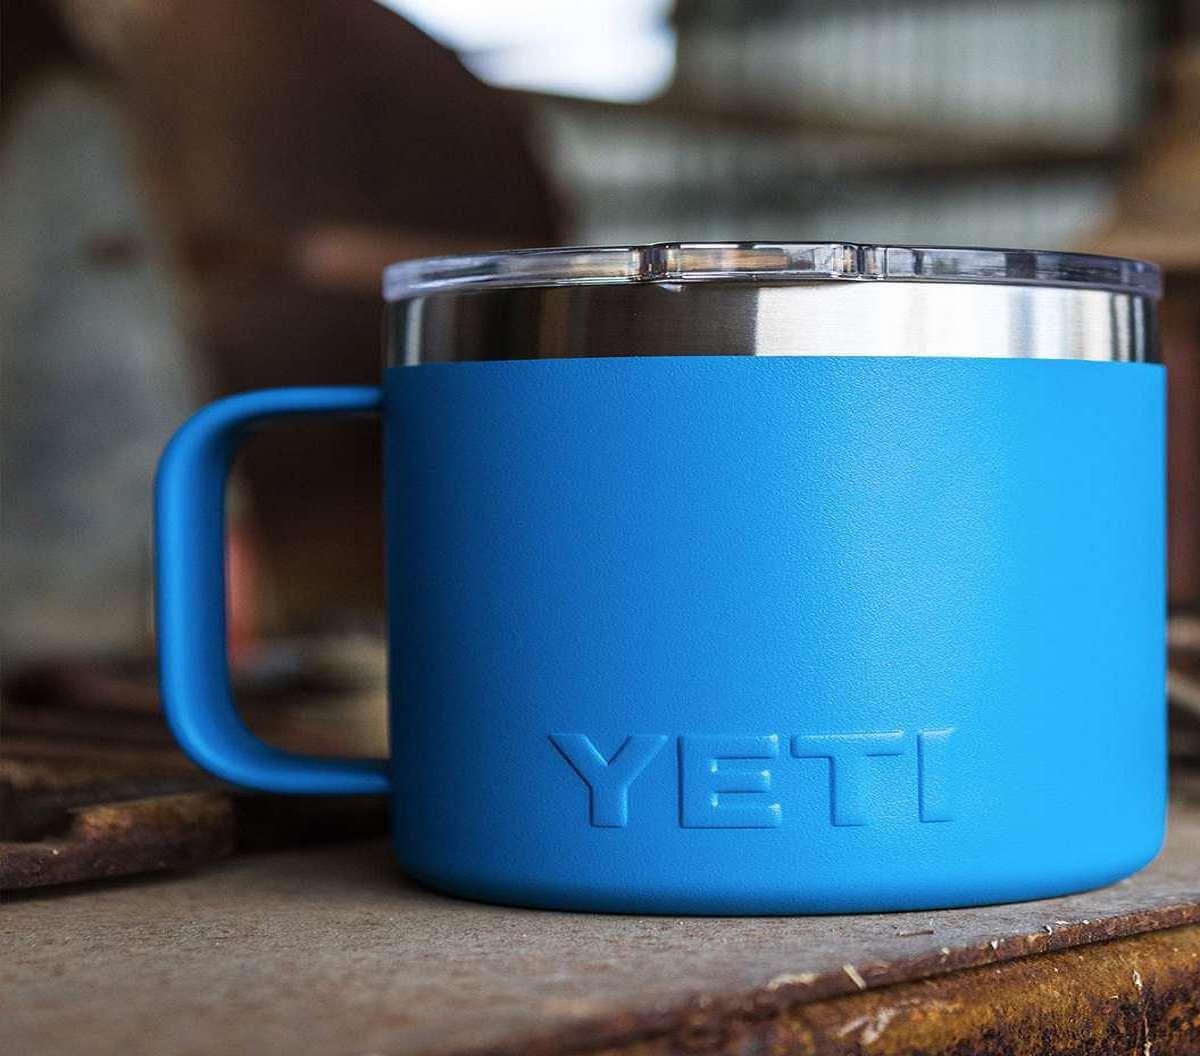 Make sure those mugs are dishwasher safe!